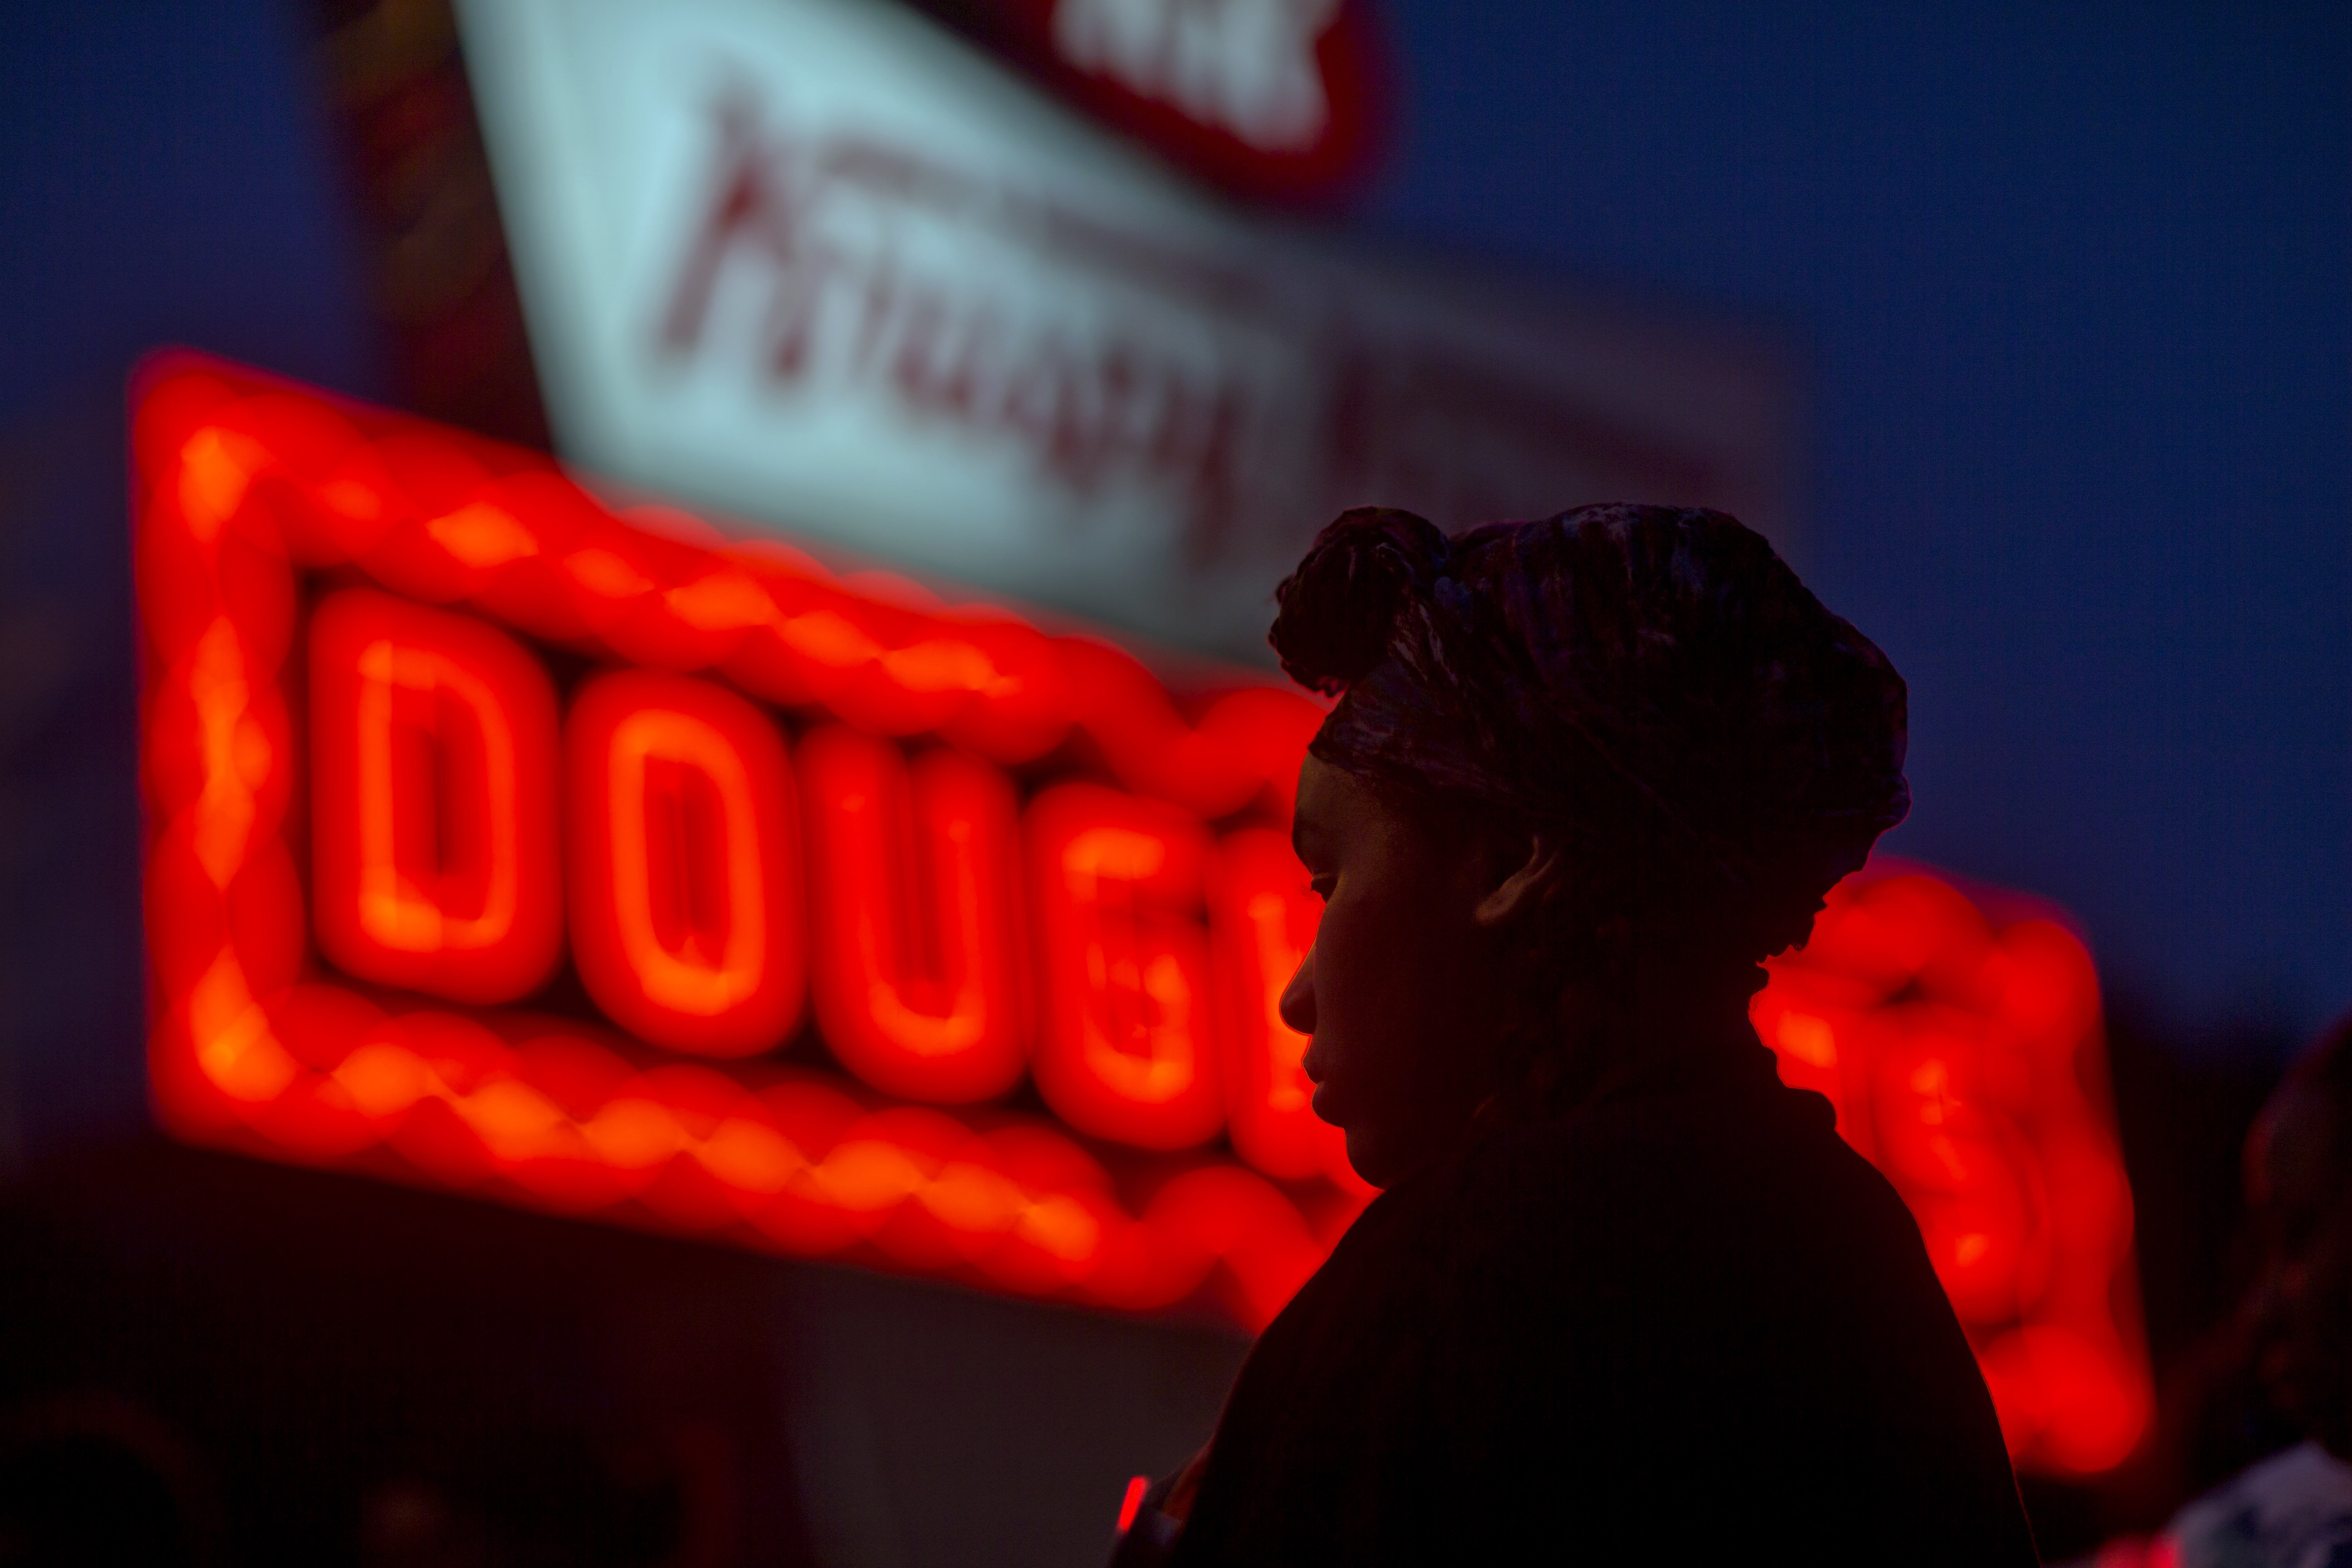 <b>Atlanta:</b> Burger King employee Keisha King, 23, stands during a protest outside a Krispy Kreme store on May 15, 2014.